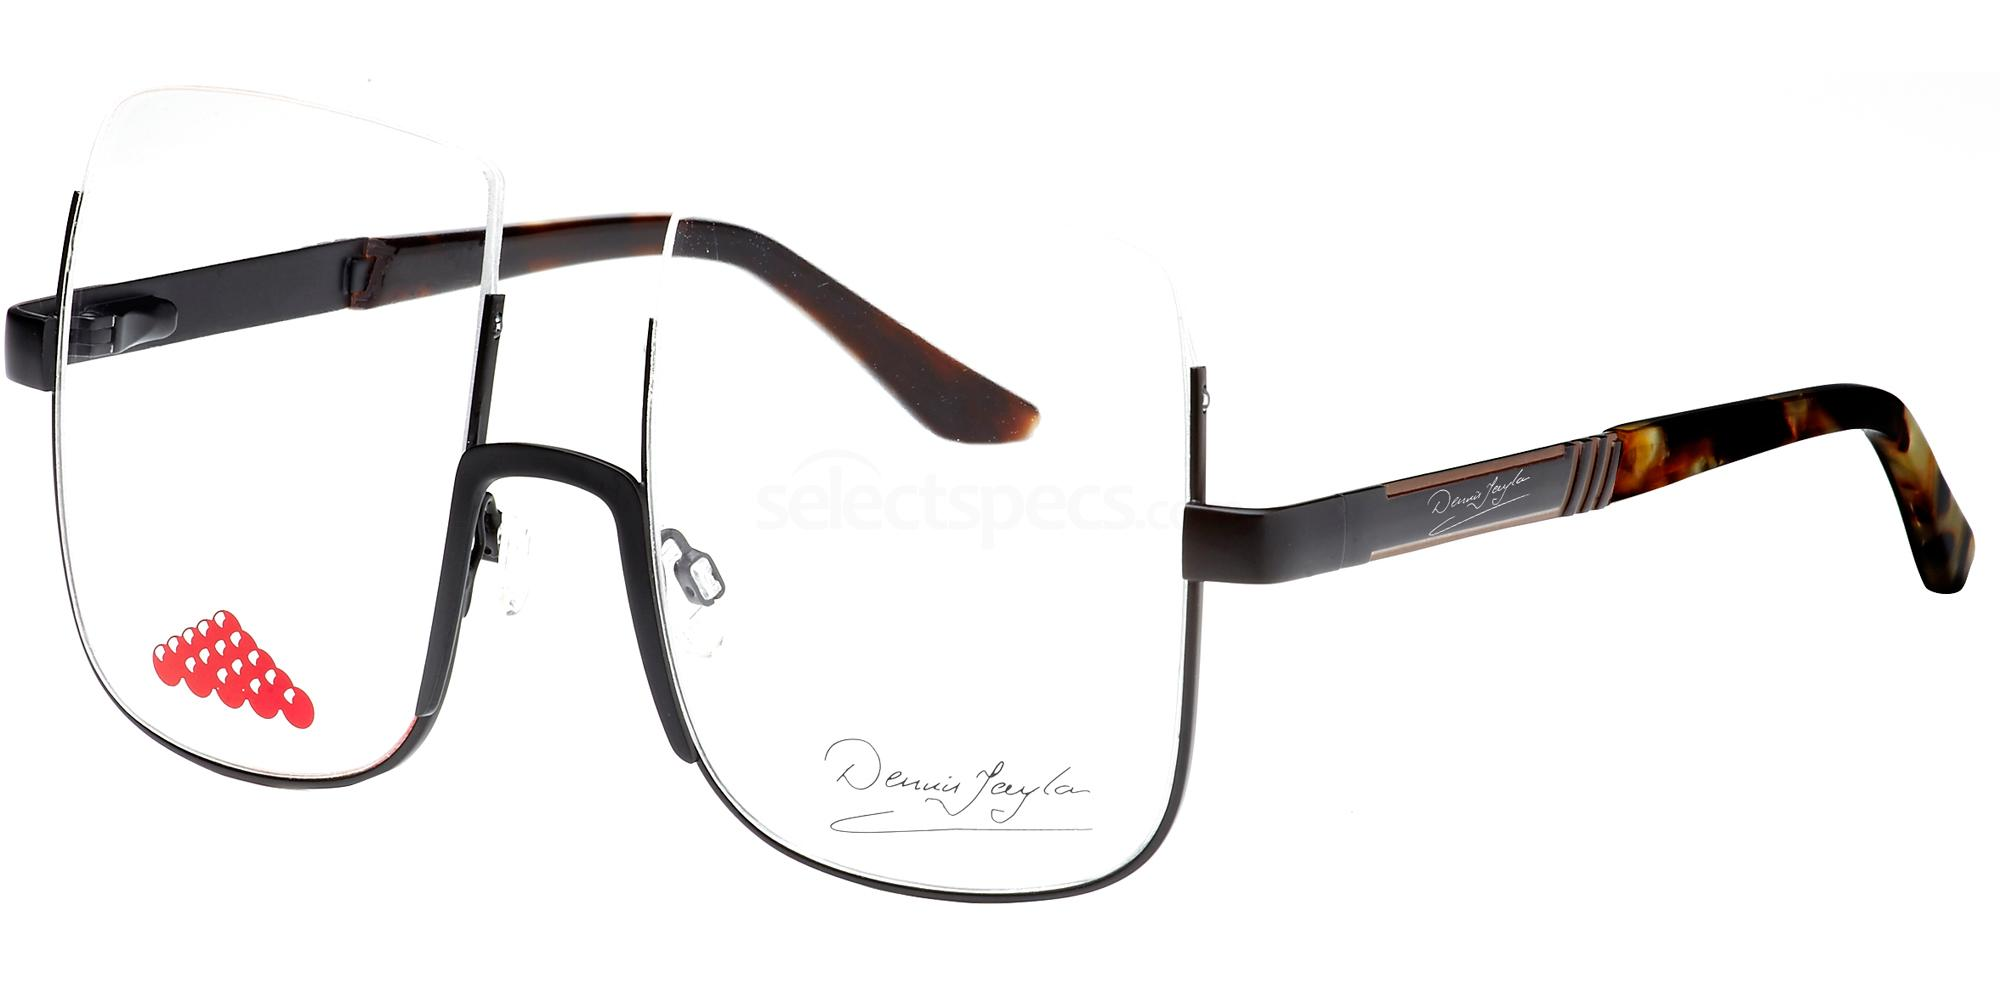 C2 DTSN02 - Pro-Snooker Glasses Glasses, Dennis Taylor